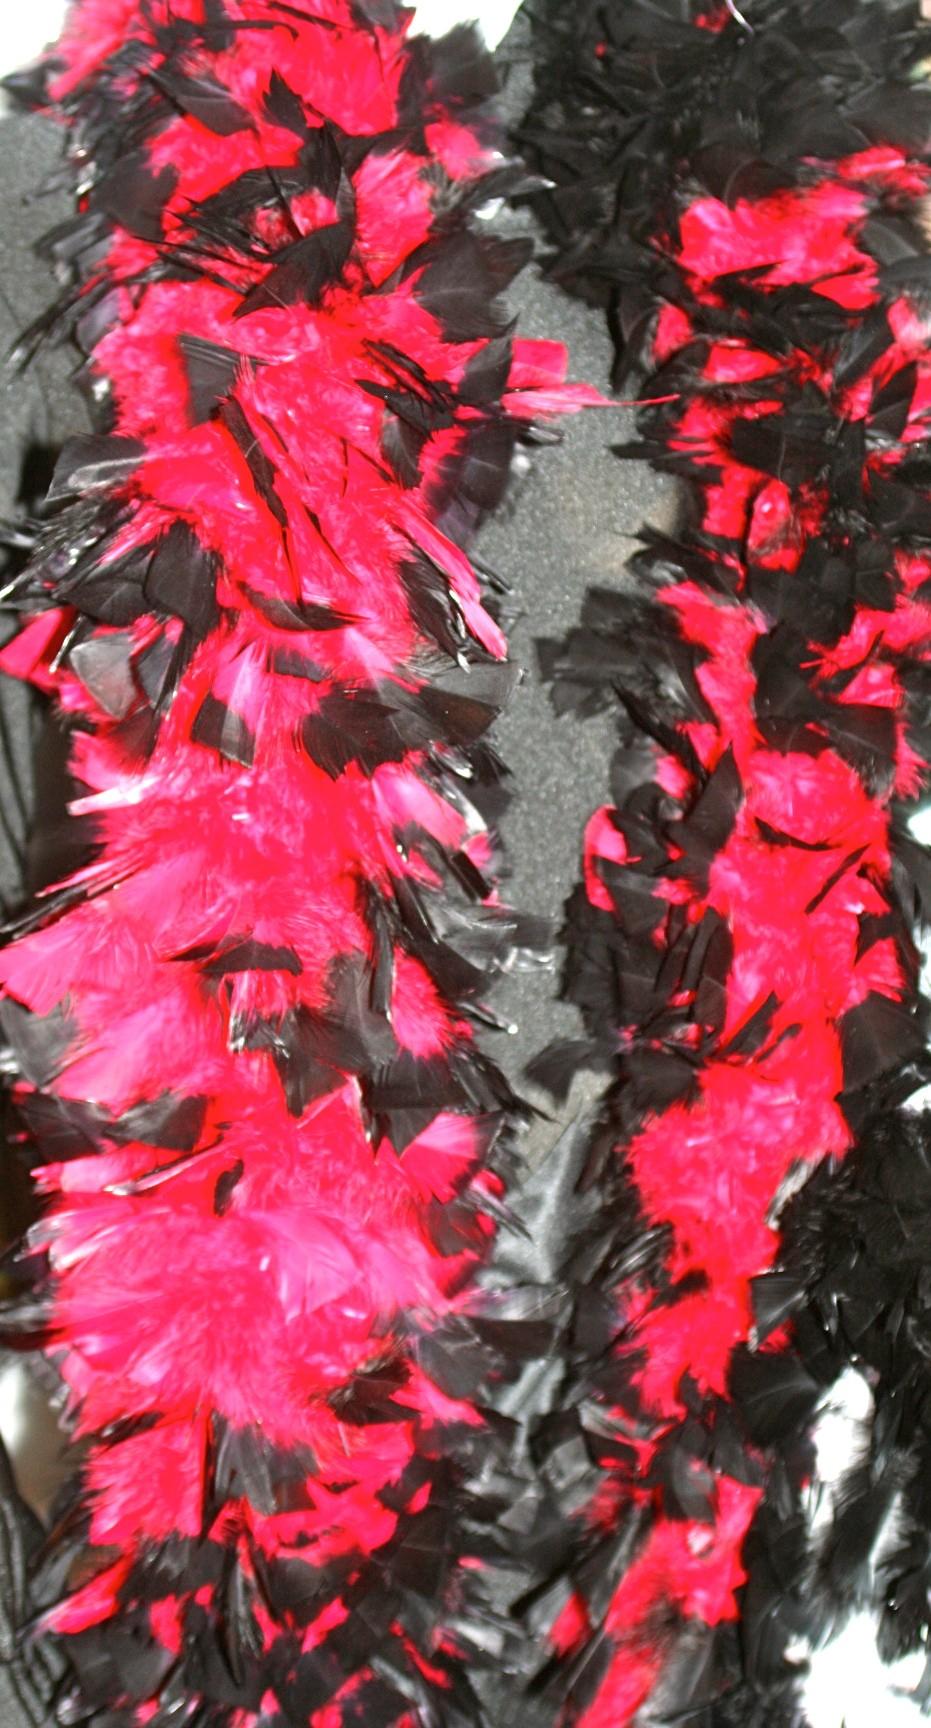 Deluxe 200g Turkey Ruff Feather Boa Feather Boa